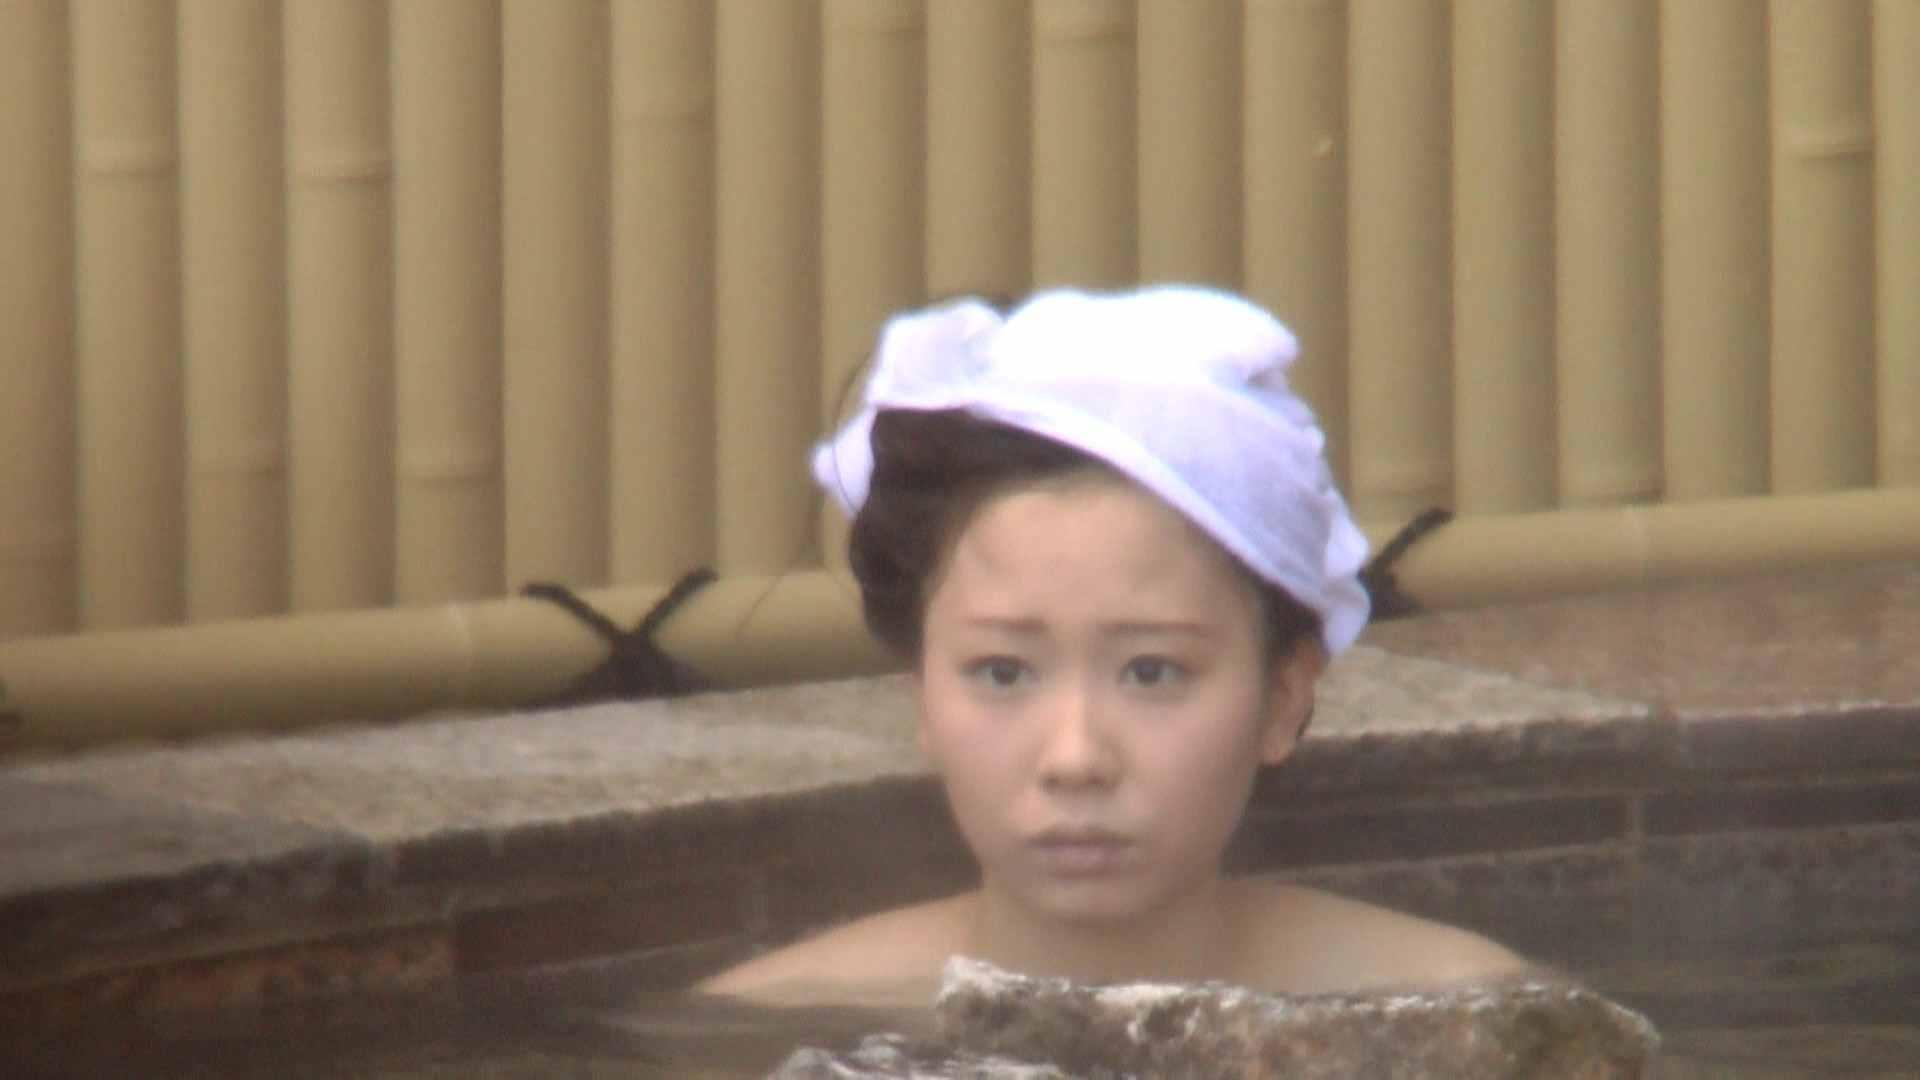 Aquaな露天風呂Vol.211 HなOL   盗撮  76pic 7